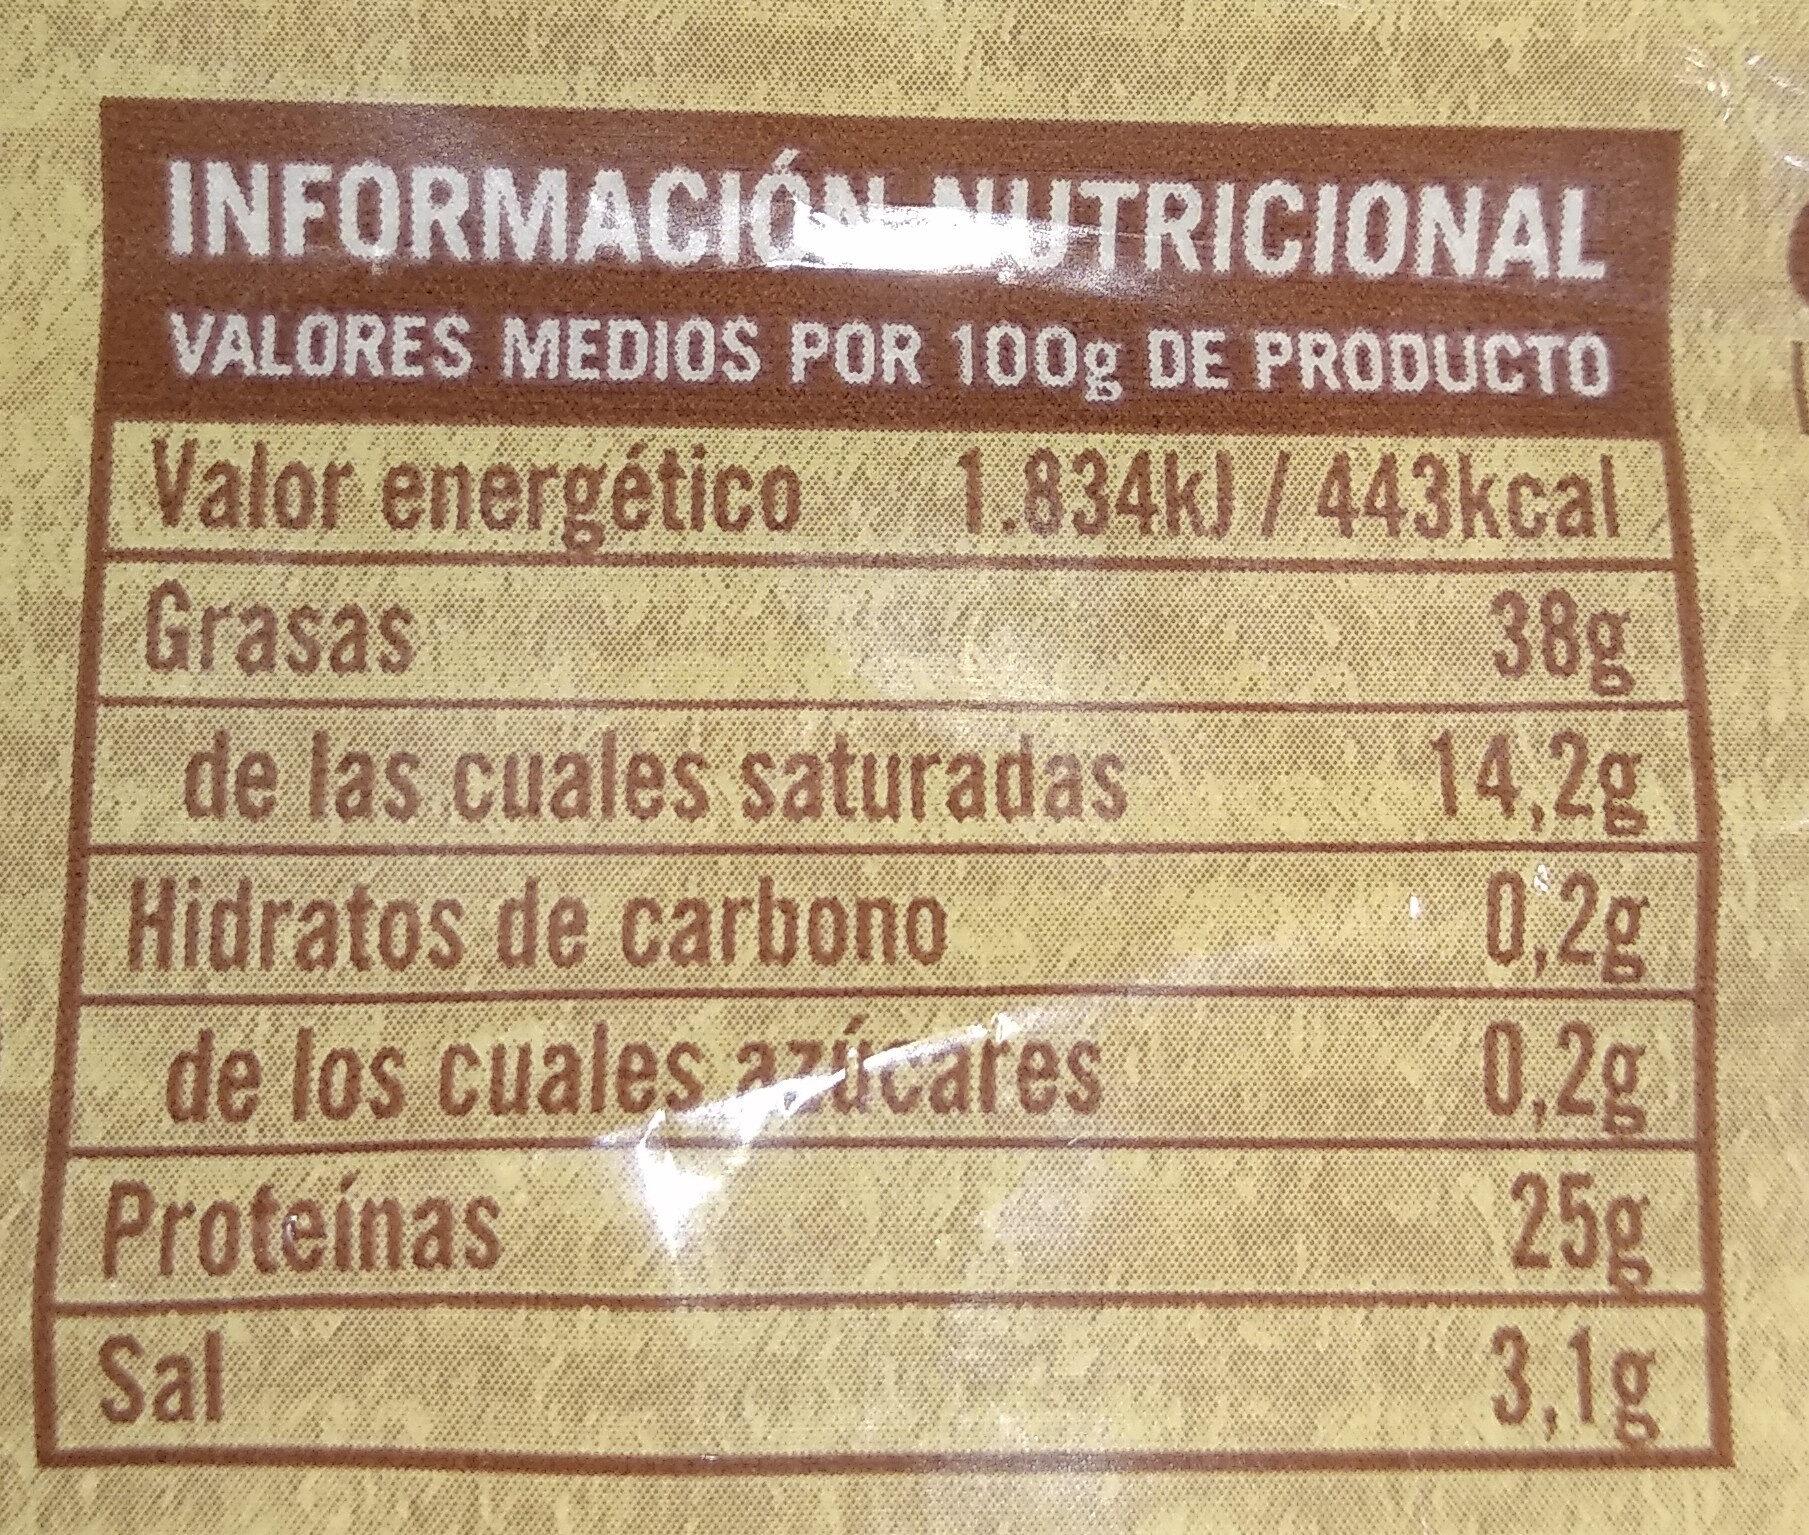 Chorizo picante - Informació nutricional